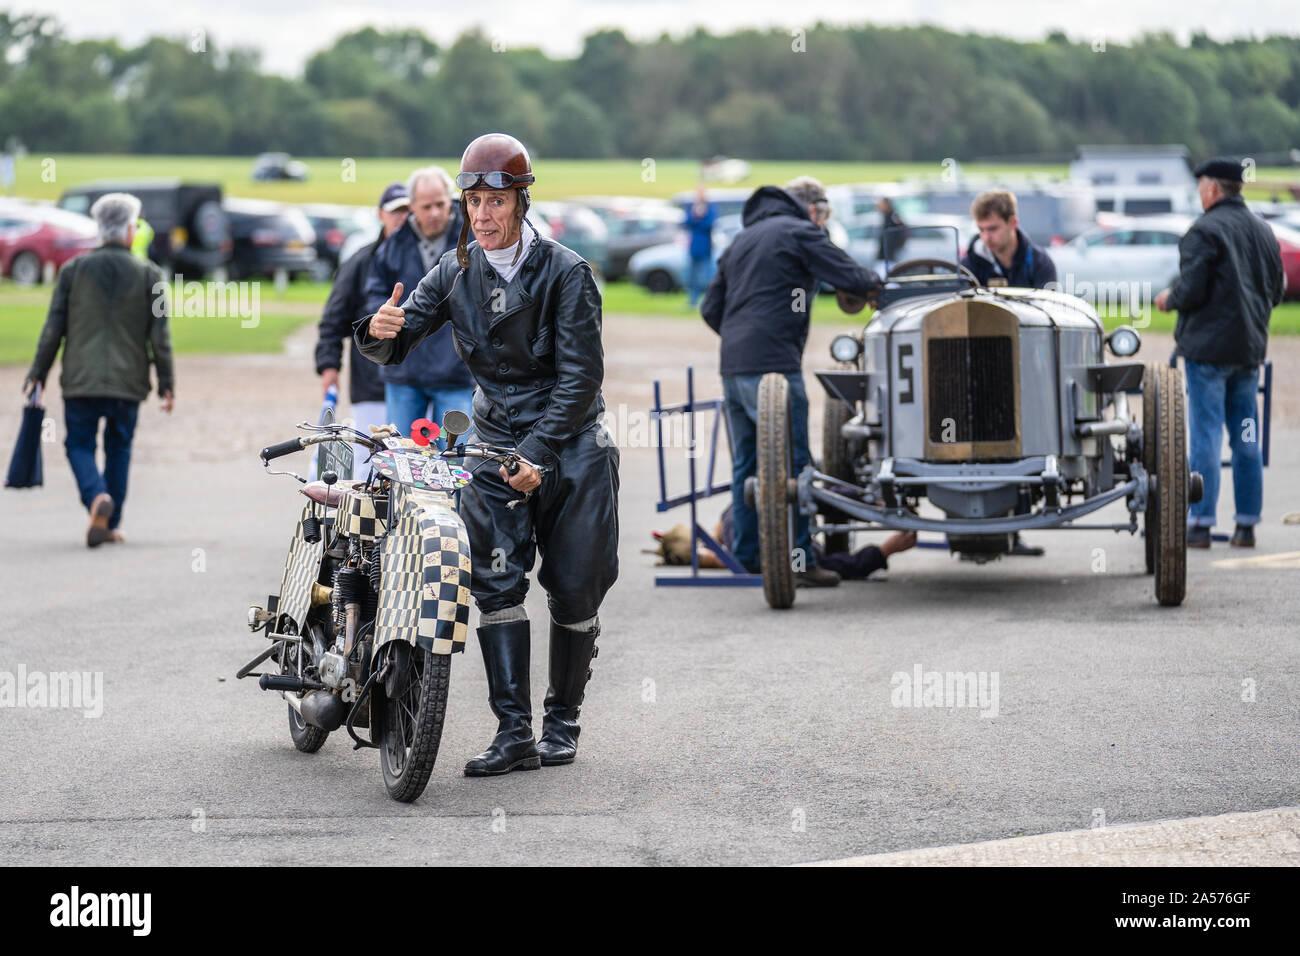 OLD WARDEN, BEDFORDSHIRE, UK ,OCTOBER 6, 2019. George Shuttleworth Speed Demon Race Day at Shuttleworth. Stock Photo